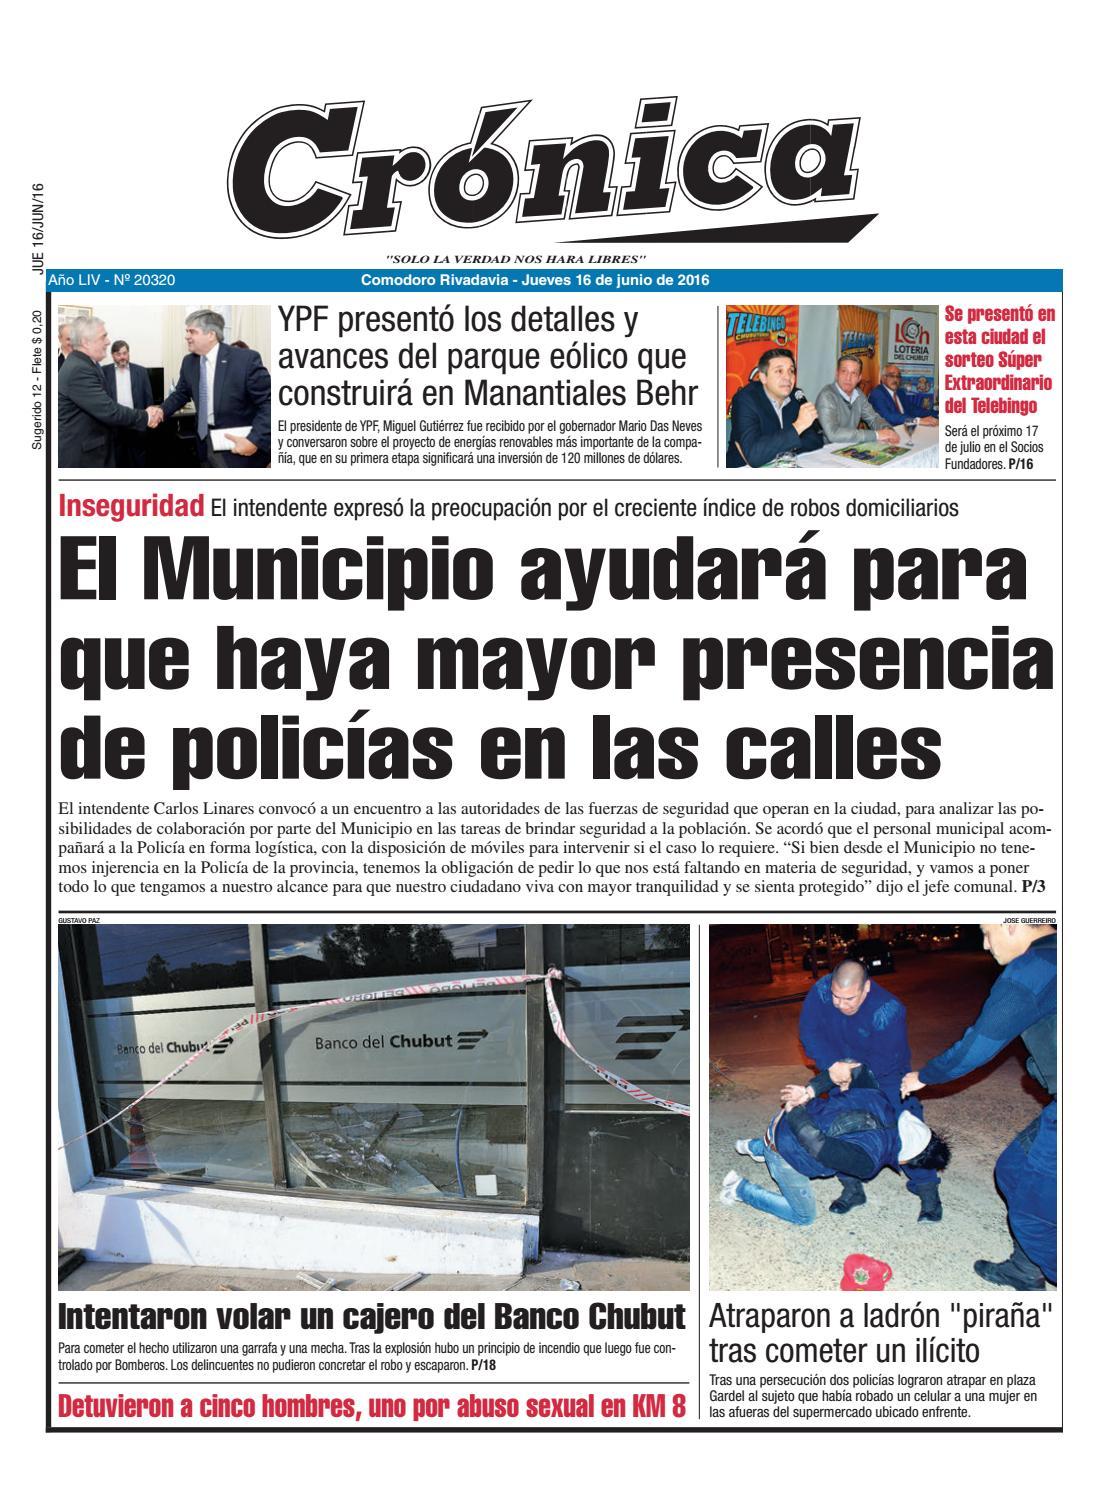 D8c70fe816c7a36a0ee0faccd4b70be5 by Diario Crónica - issuu